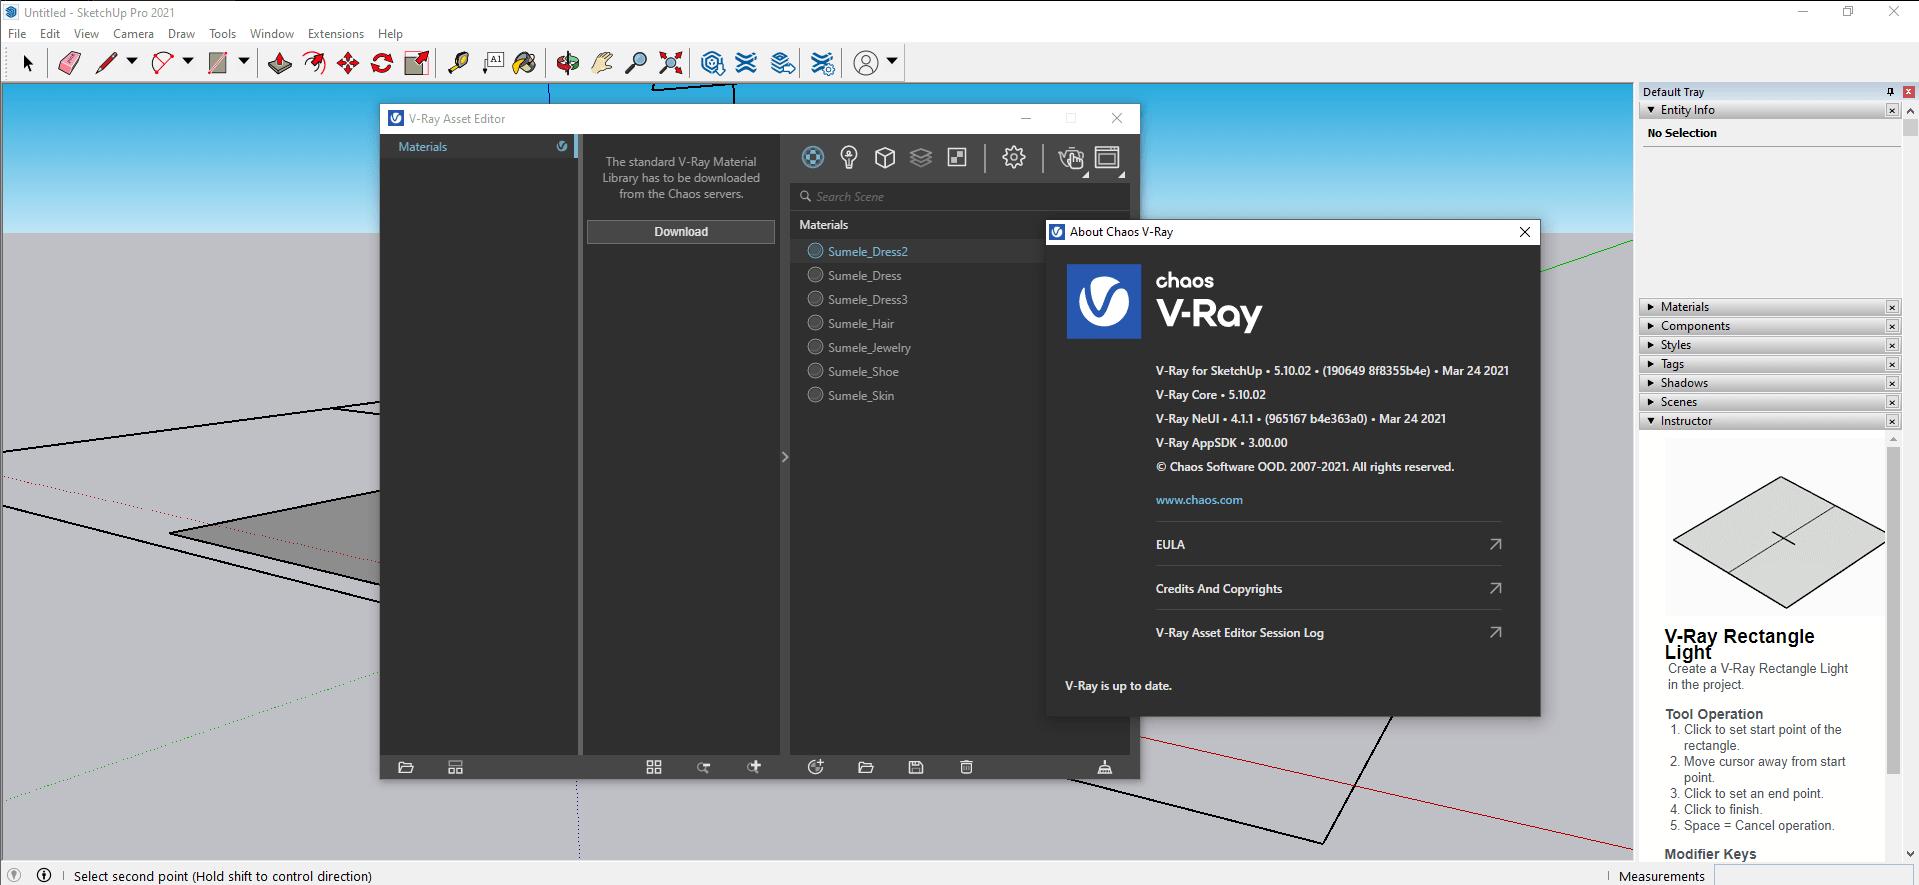 VRay Next 5.10.05 for SketchUp 2017-2021 serial key